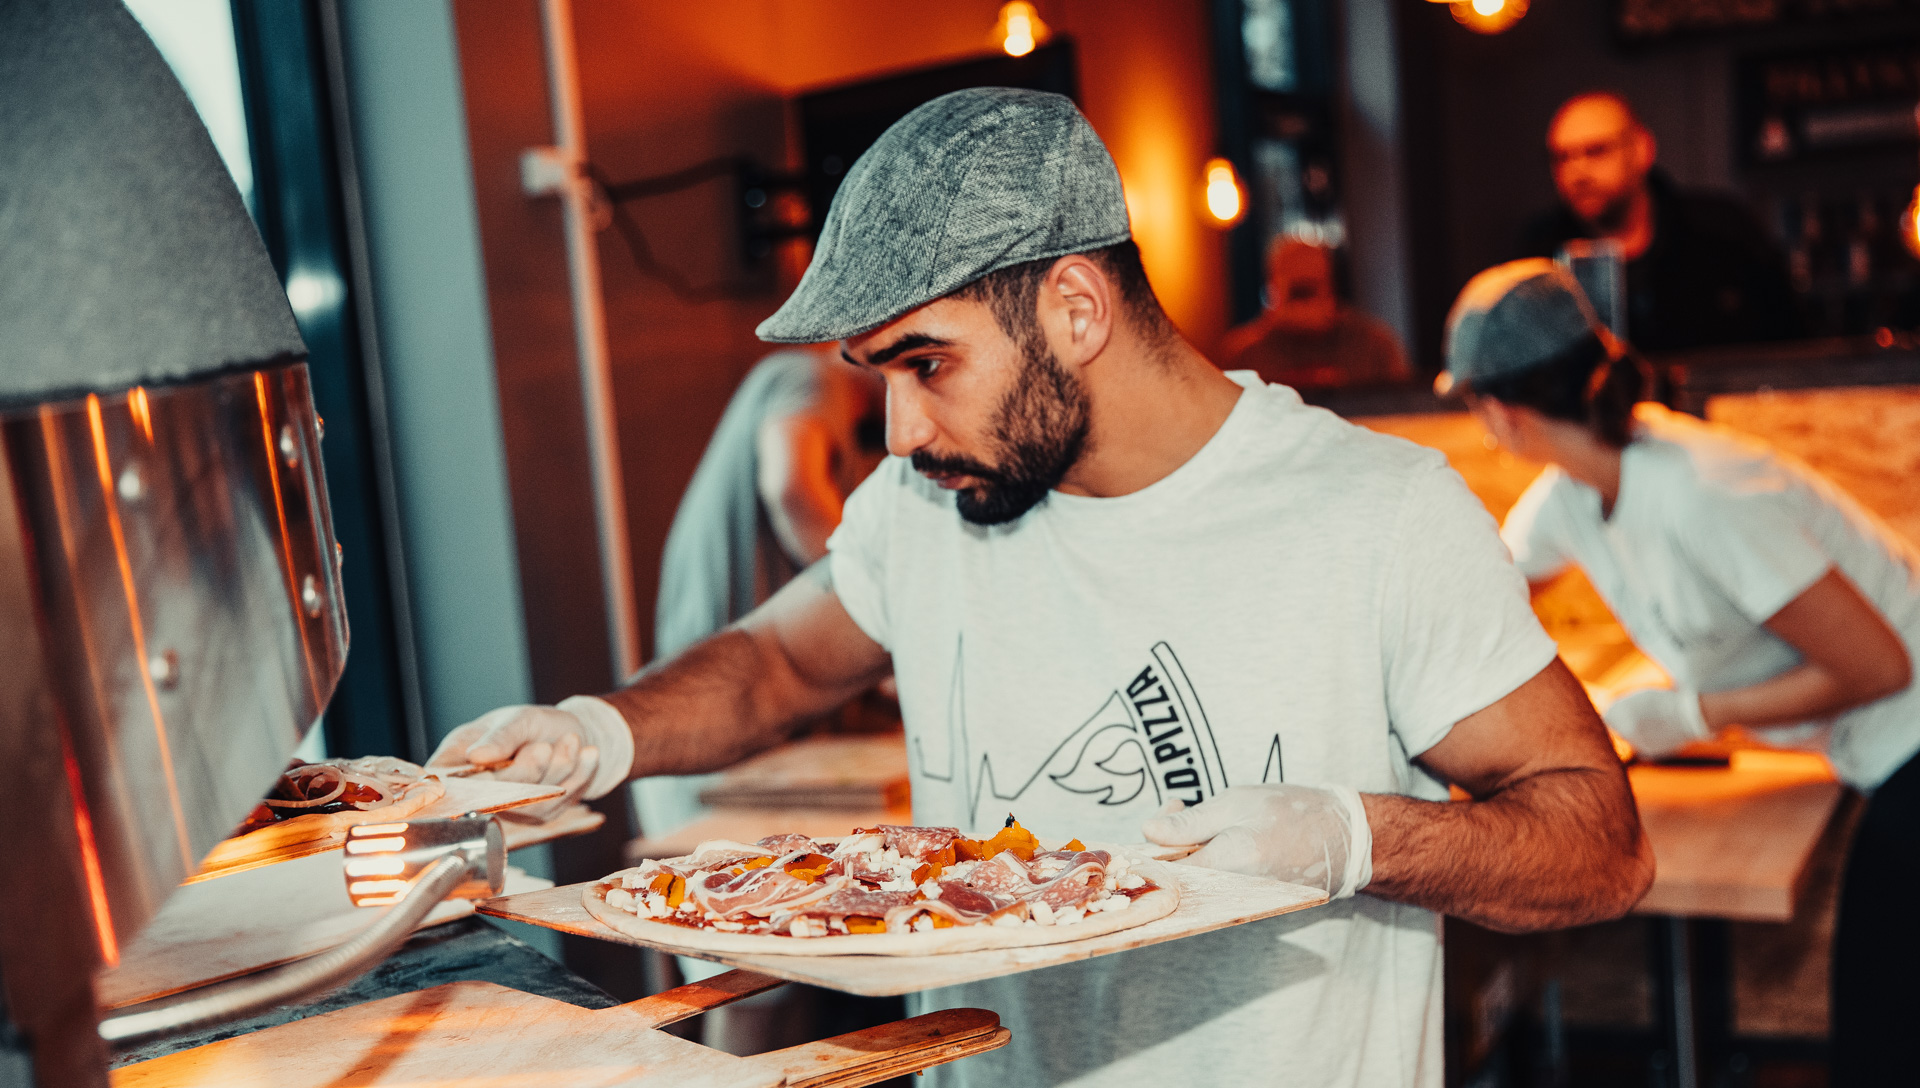 Frisk fra stenovn: Populær kæde runder 250.000 pizzaer